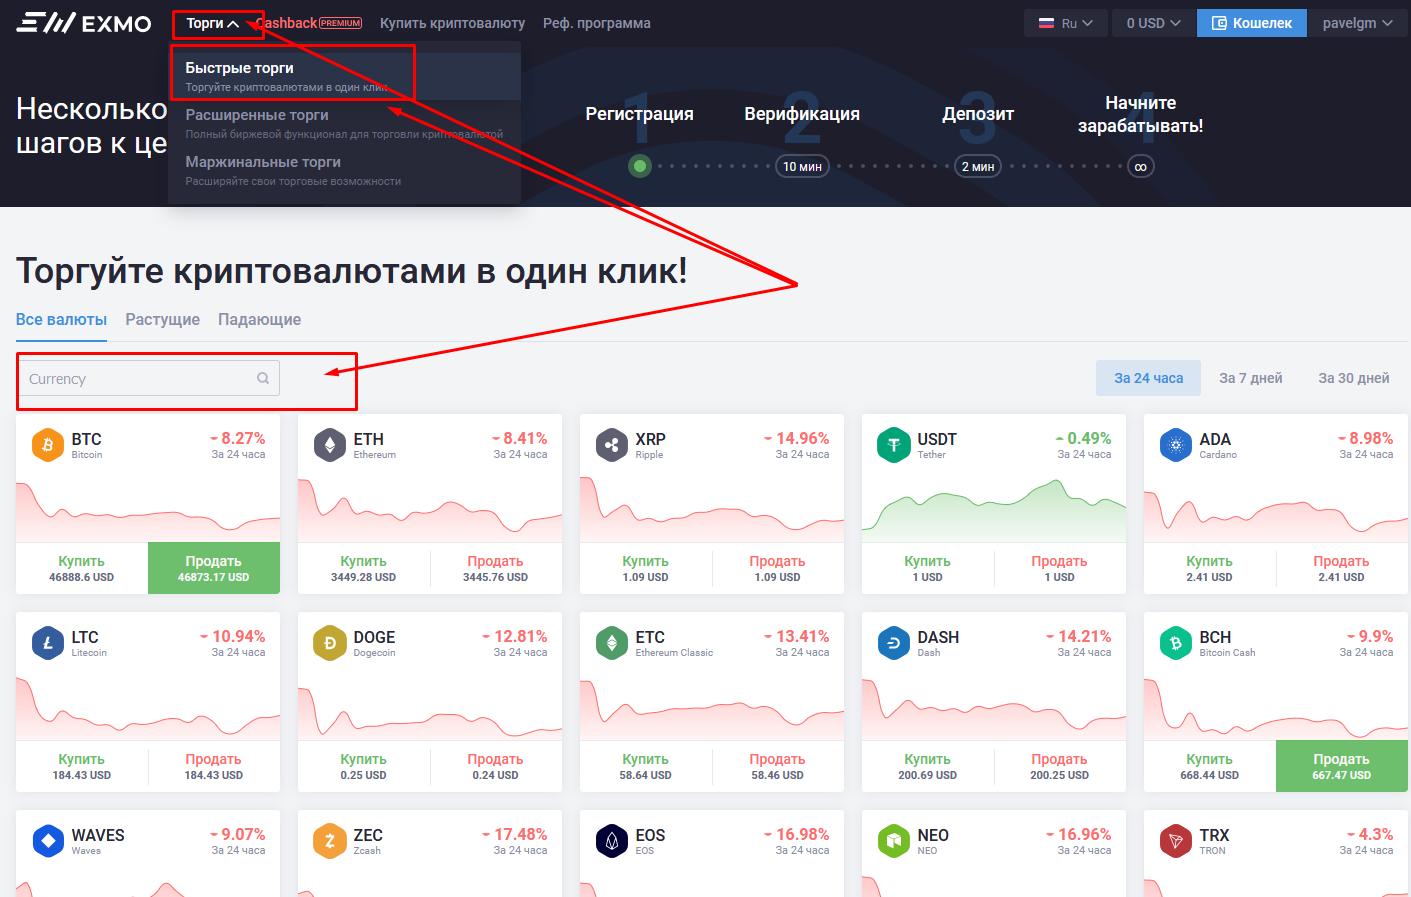 Биржа EXMO: ассортимент криптовалют